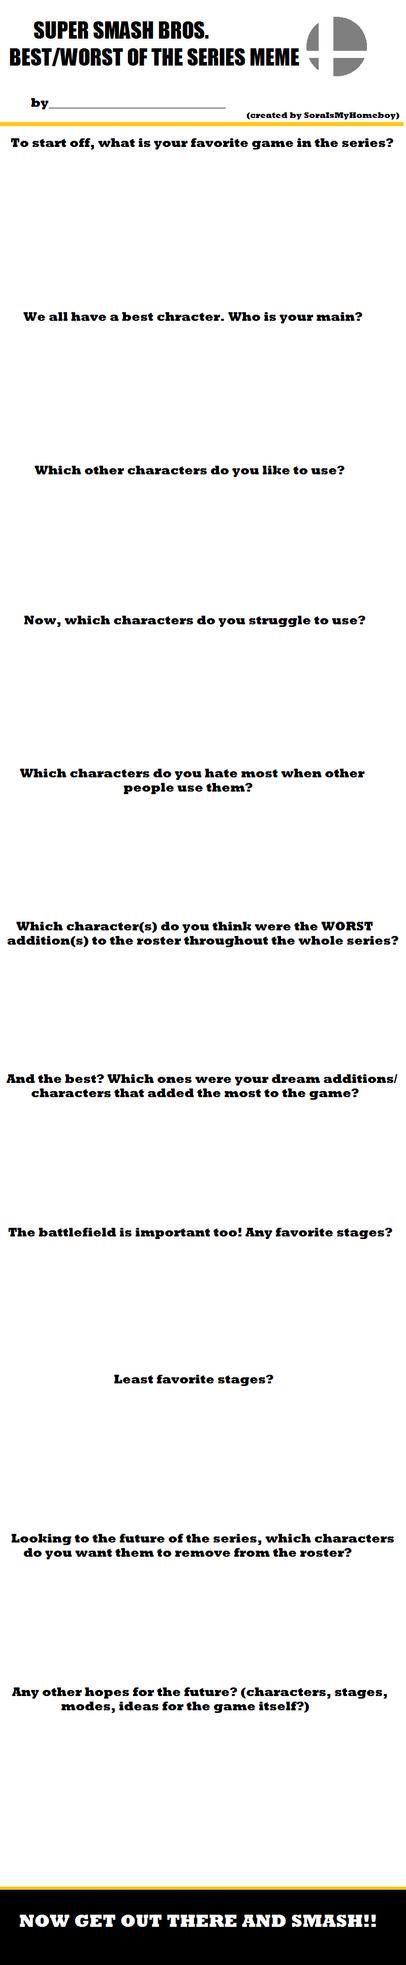 Best/Worst of Smash Bros Meme - Template by GECKO-Nuzlockes